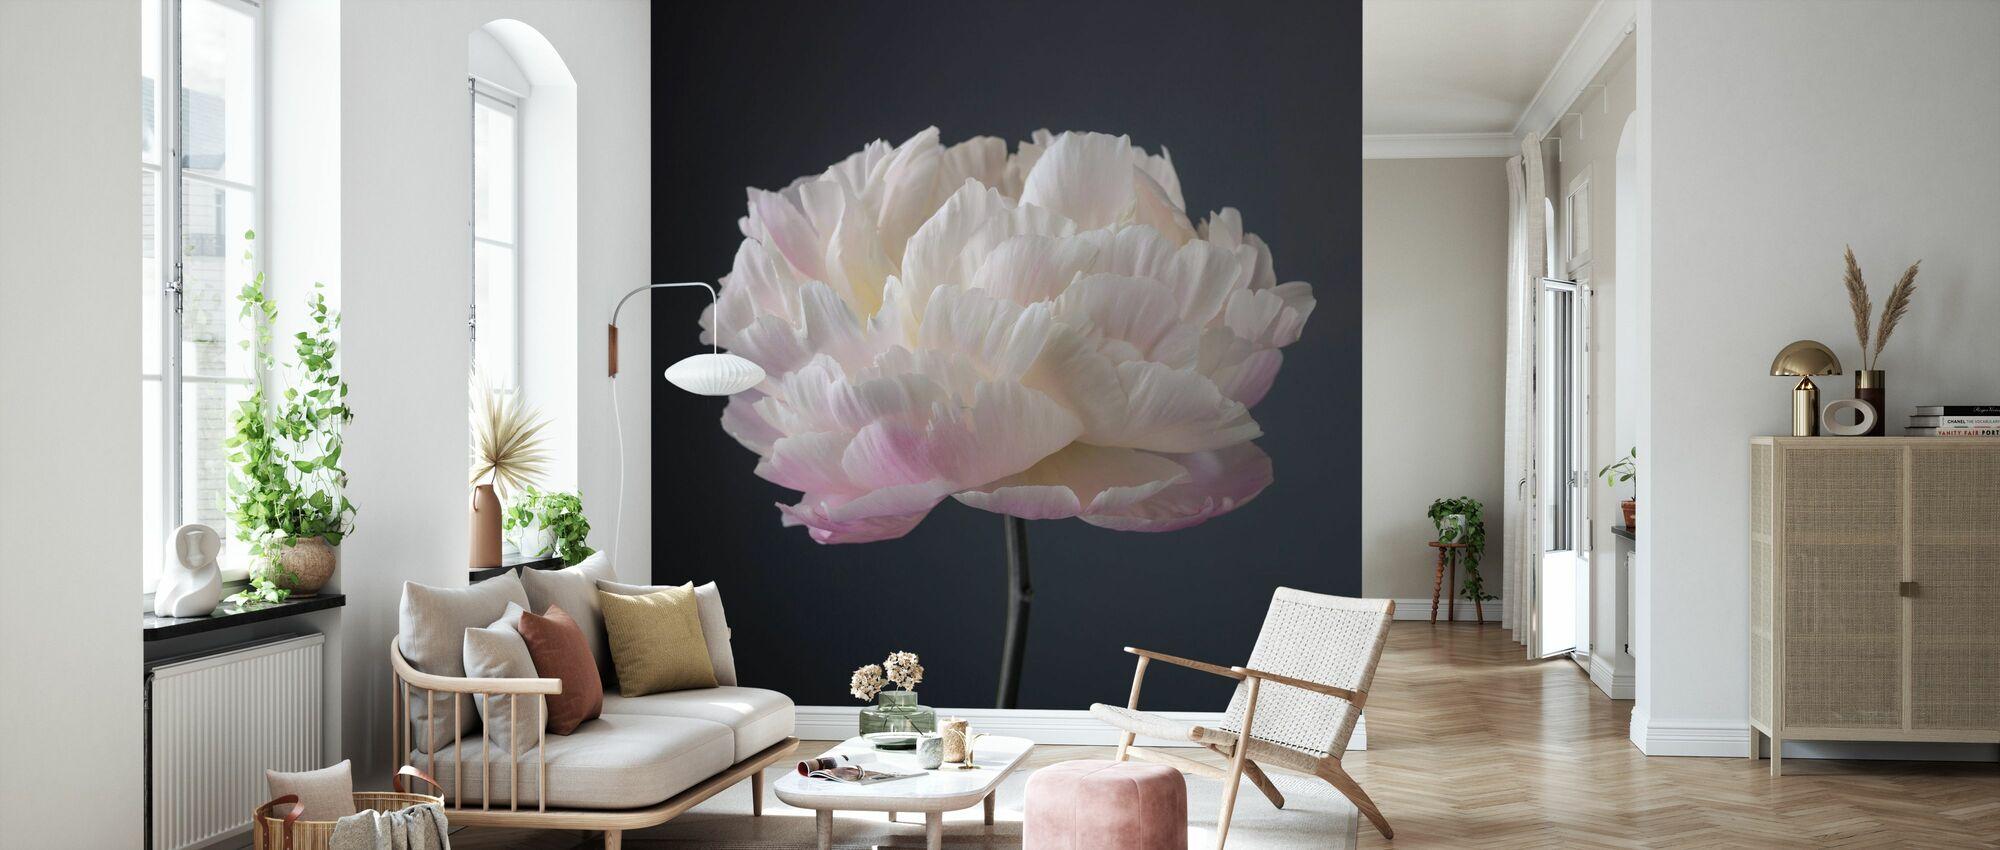 Peonies - Wallpaper - Living Room